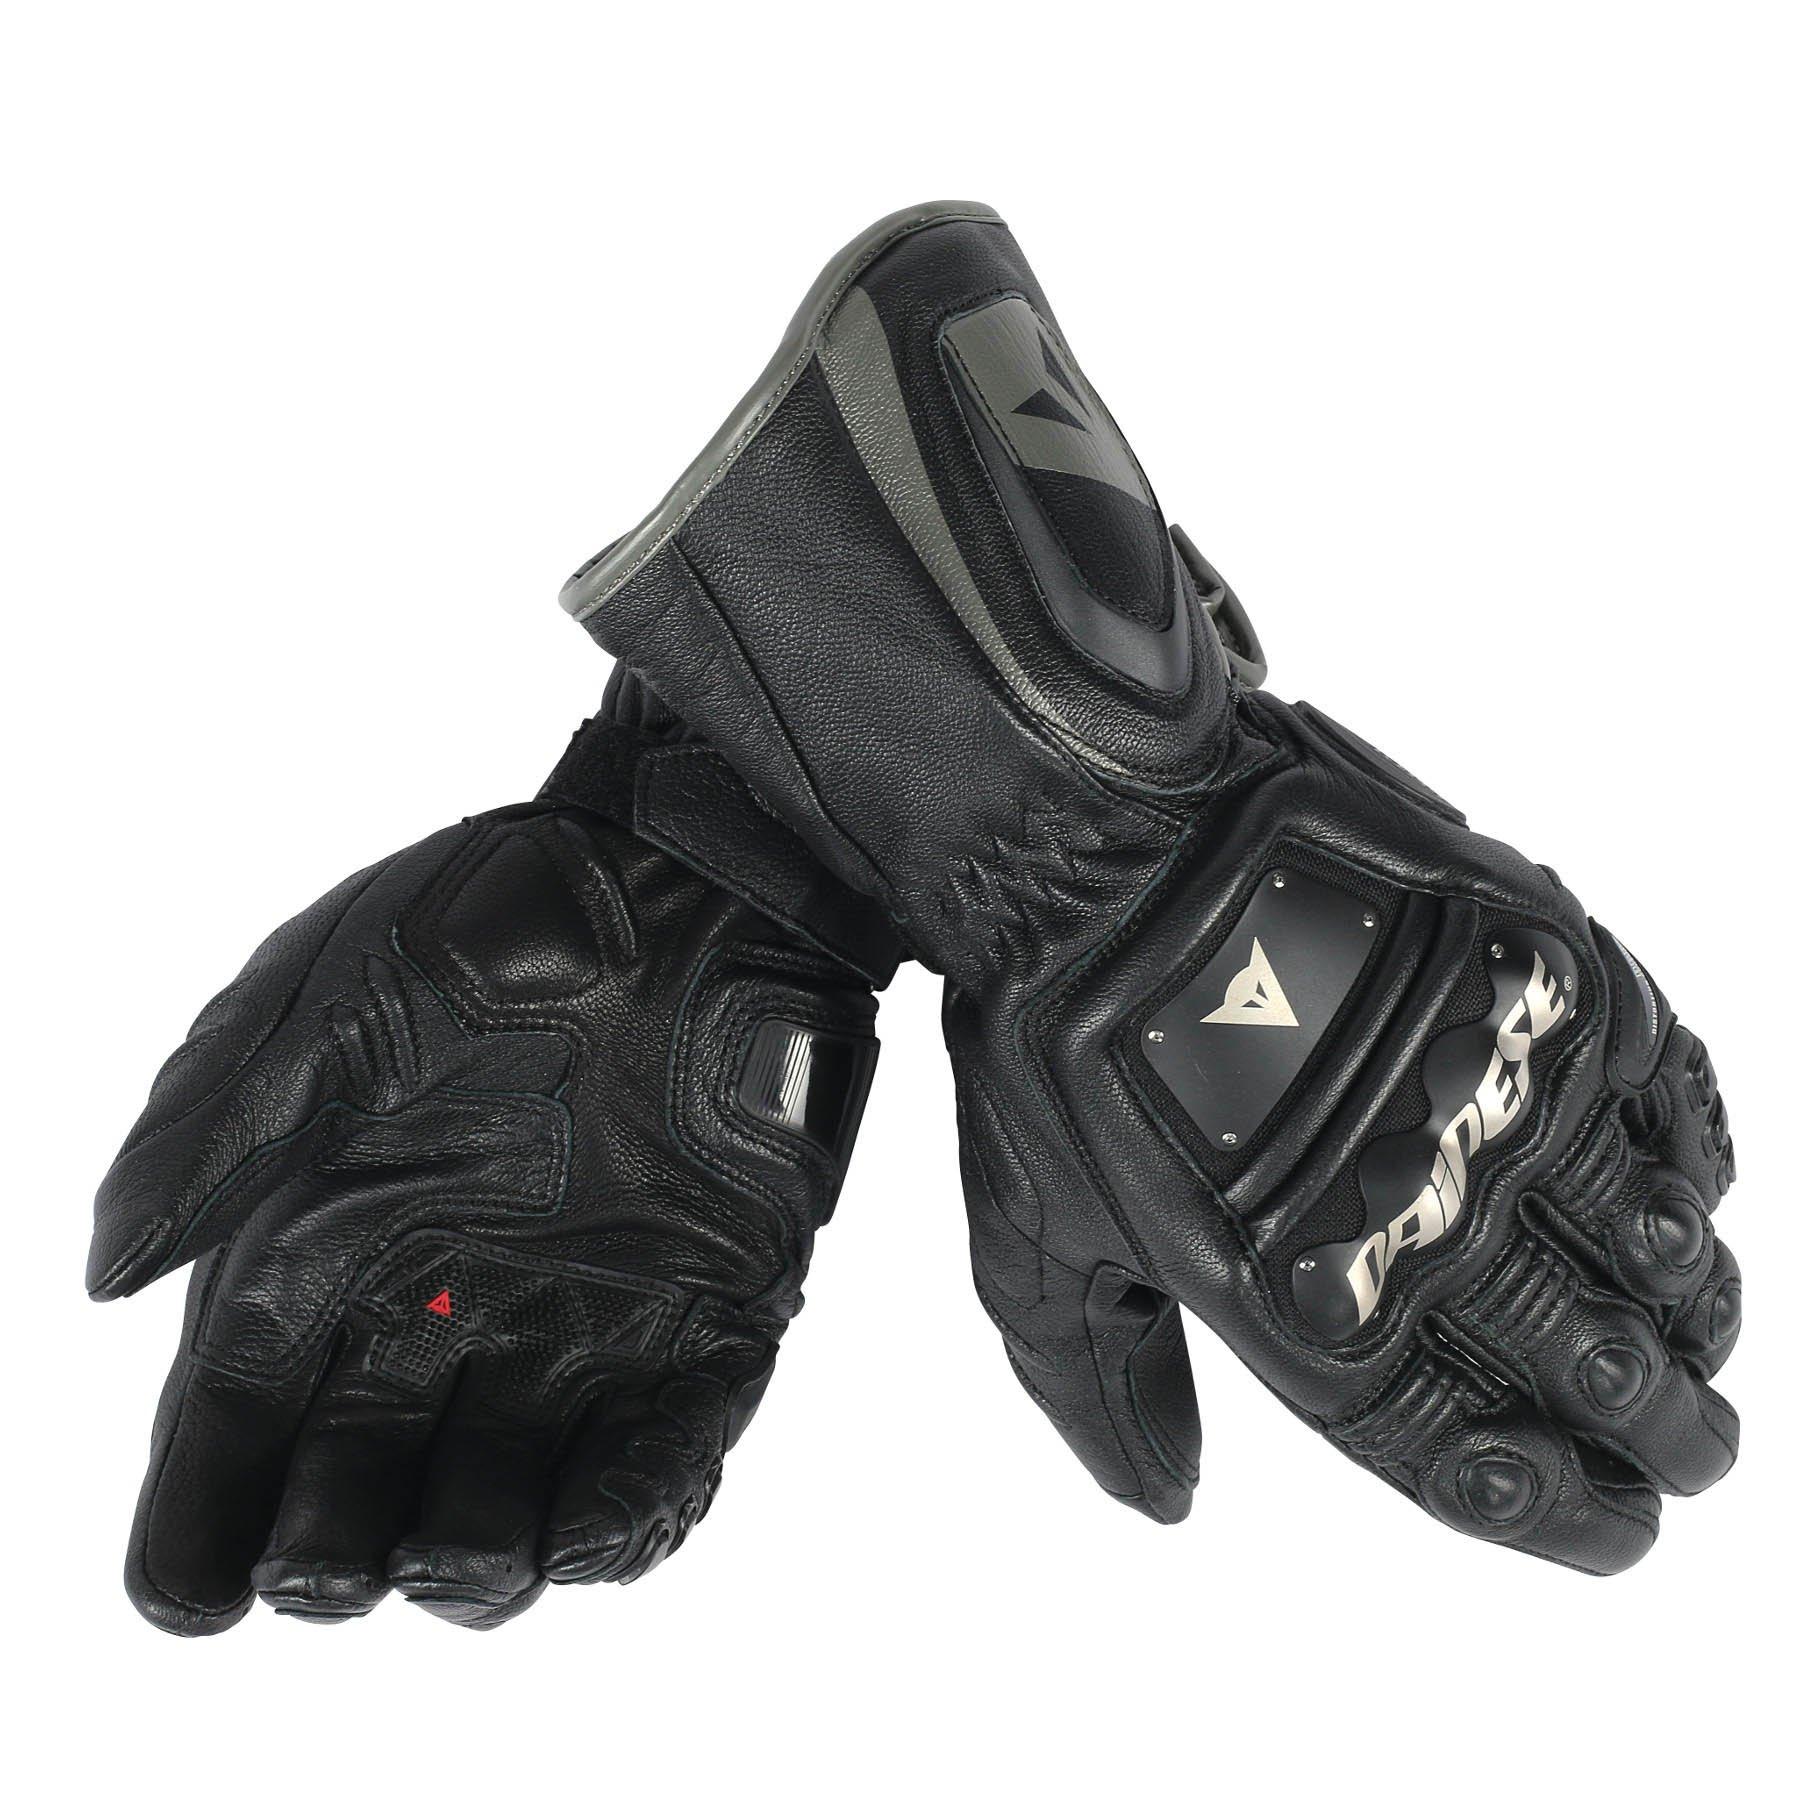 Dainese 4 Stroke Long Men's Street Motorcycle Gloves - Black/Black/Black/Large